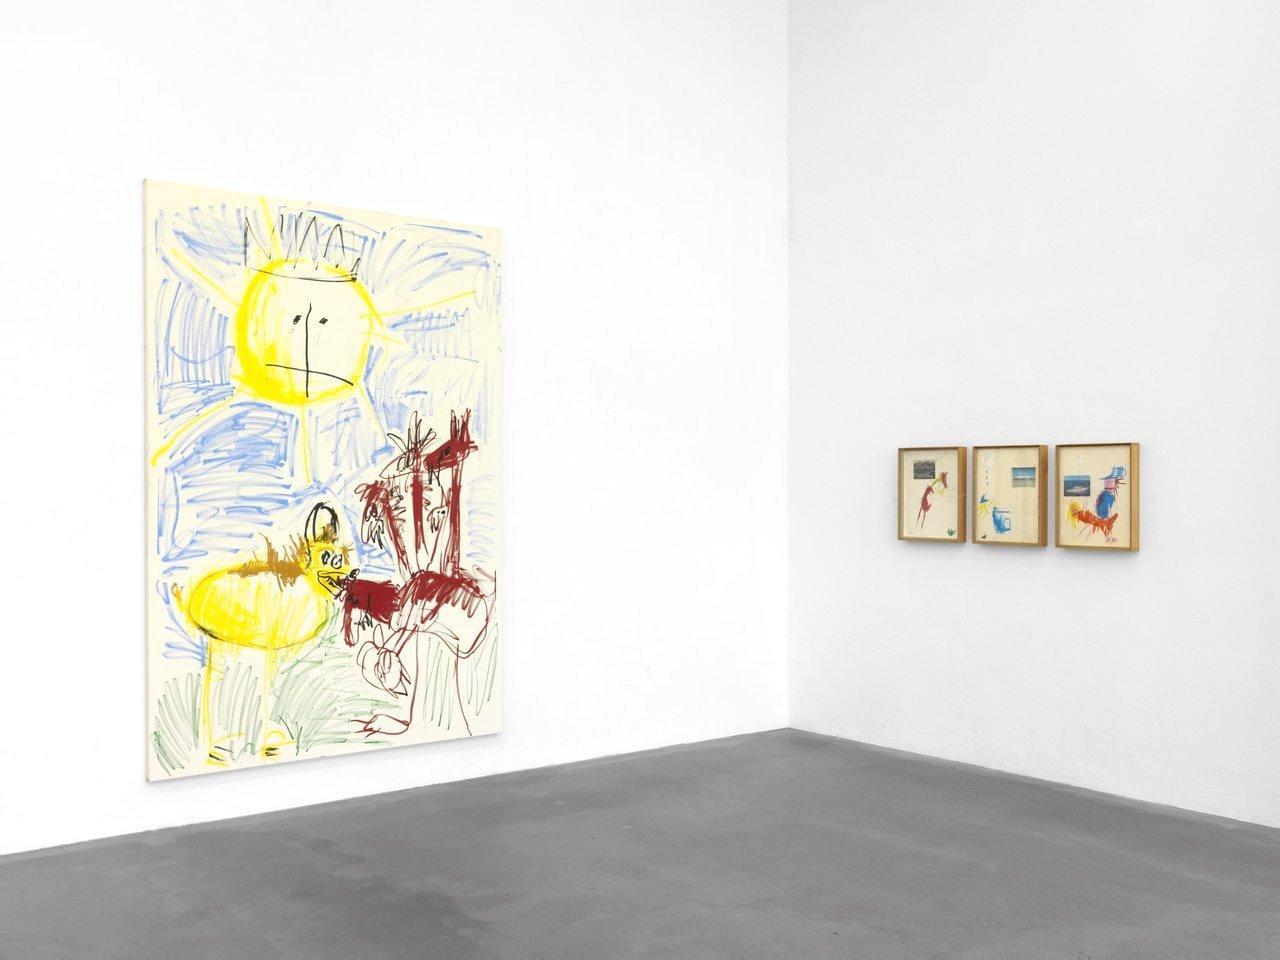 Installation viewof Andi Fischer's works atBerlin Masters 2018, 24 September - 7 October 2018 © Bernd Borchardt